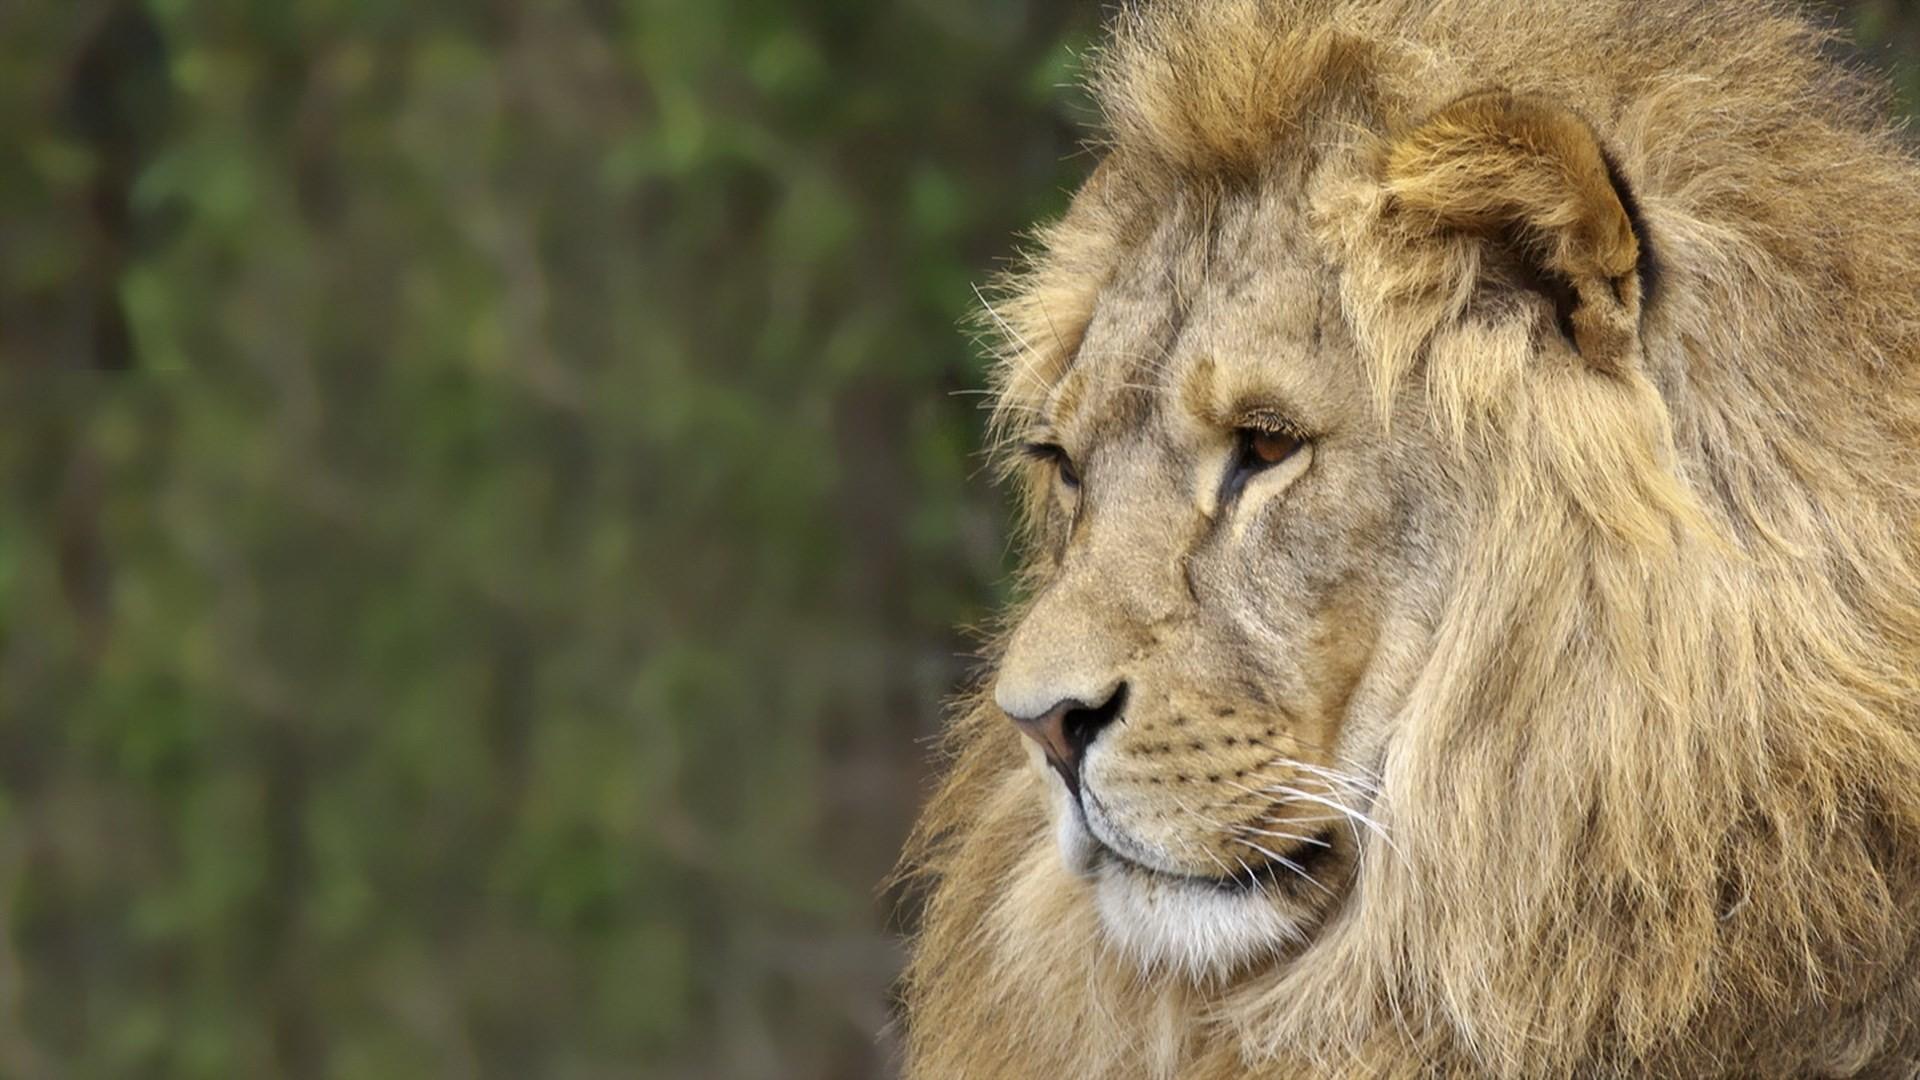 free wallpaper and screensavers for lion (Jamar Nail 1920×1080)